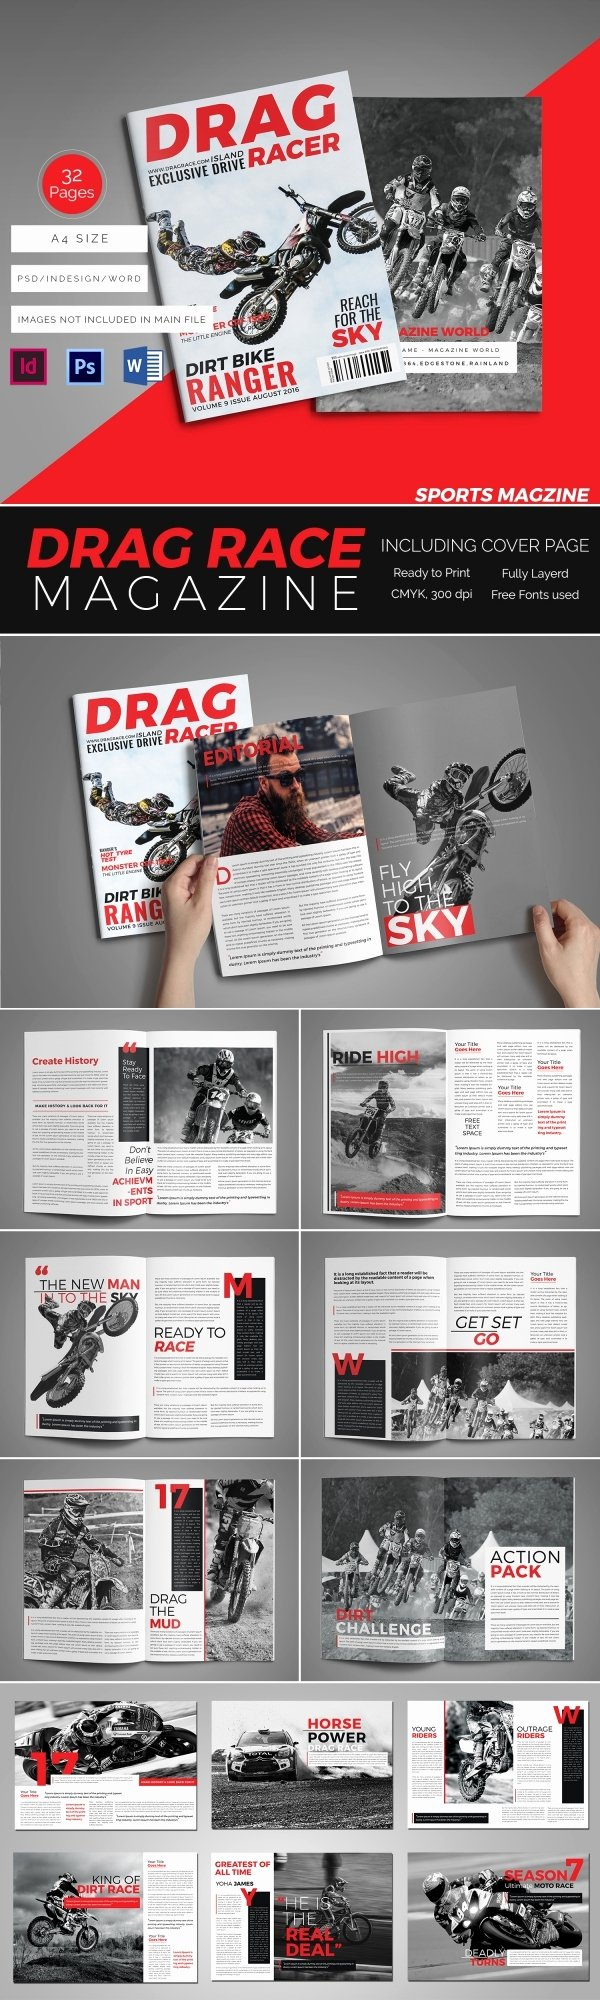 Magazine Template Free Word Unique 55 Brand New Magazine Templates Free Word Psd Eps Ai